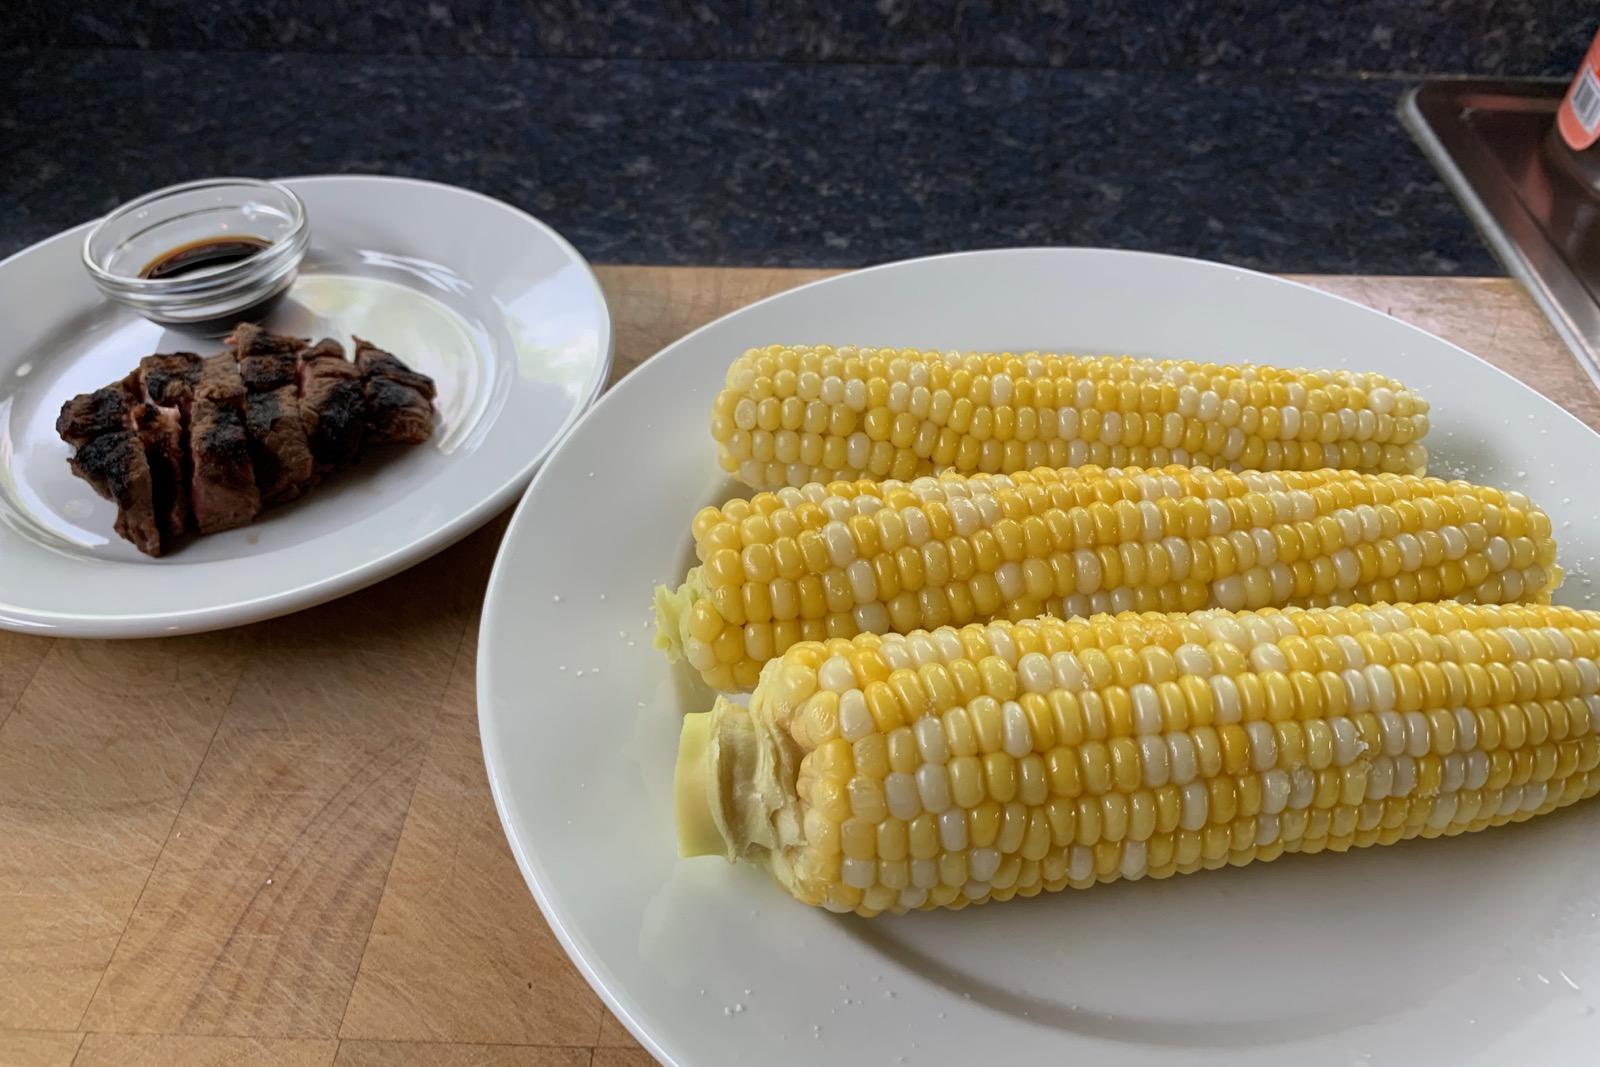 http://blog.rickk.com/food/2020/07/20/ate.2020.07.19.d.jpg